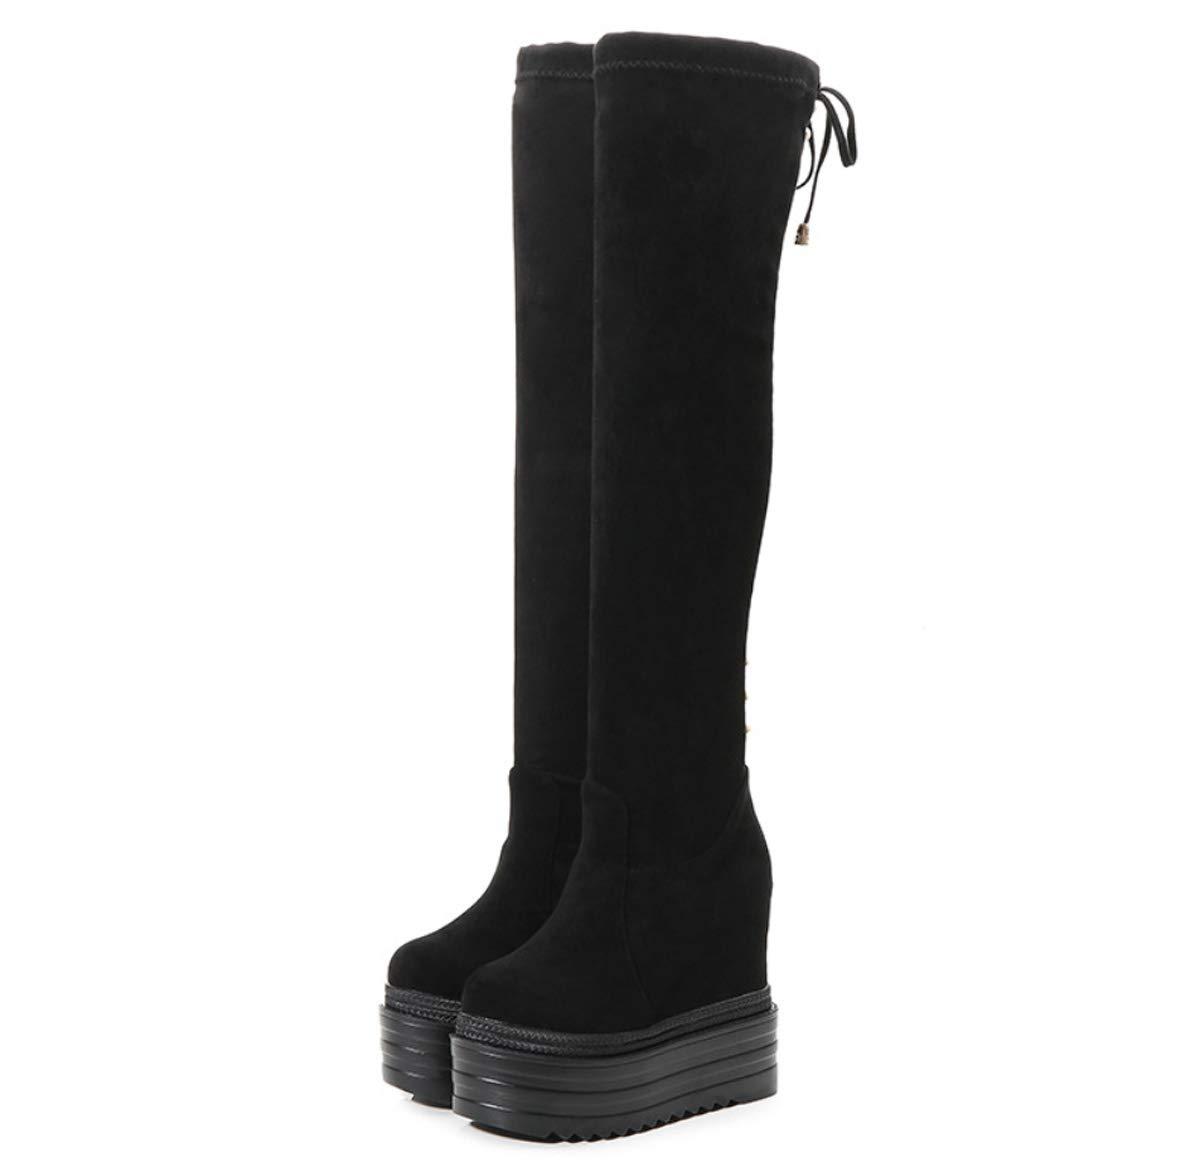 DANDANJIE damen Stiefel Over The Knie Stiefel mit Keilabsatz Rutschfeste Stiefel Winter warme Outdoor Hidden Heels Stiefel